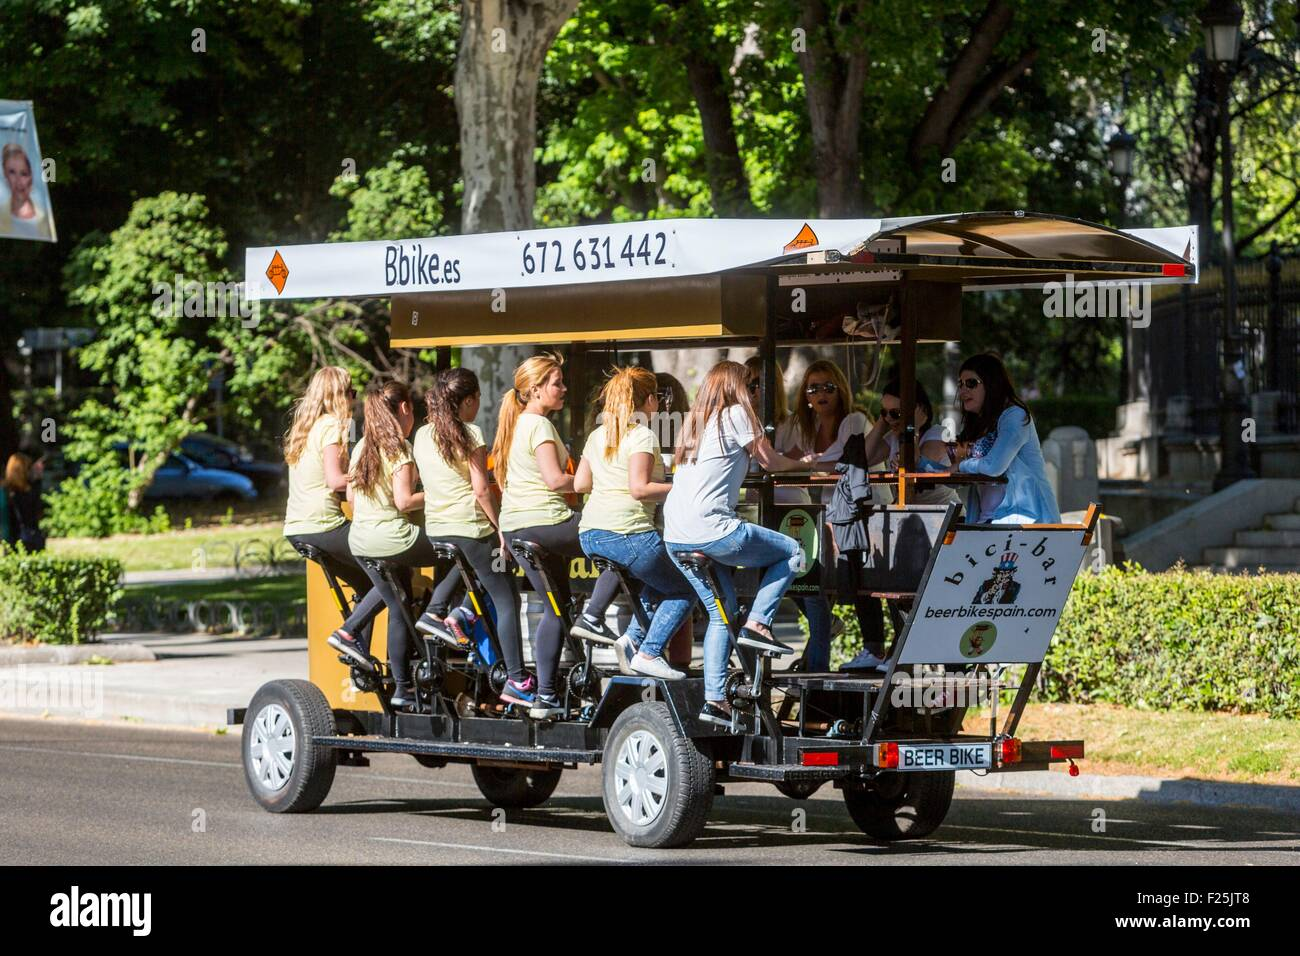 Spain, Madrid, bar caravan advancing by pedaling - Stock Image